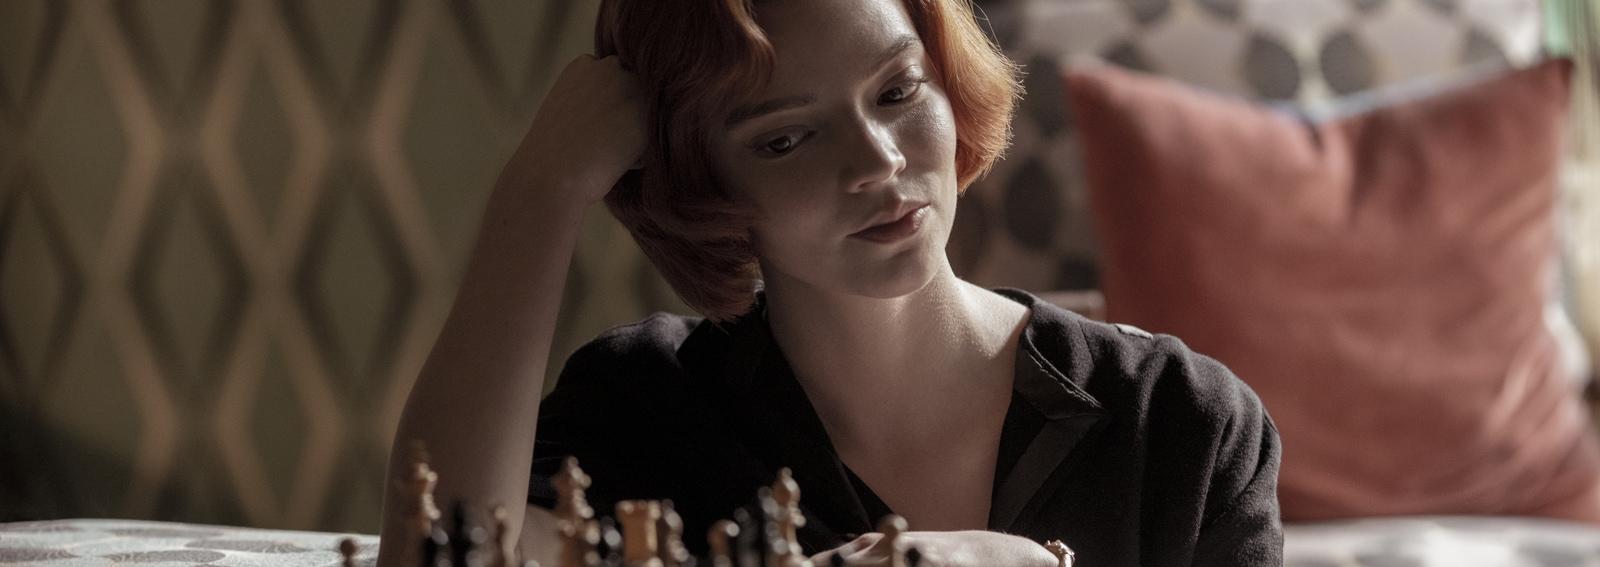 dekstop_la regina degli scacchi_grazia